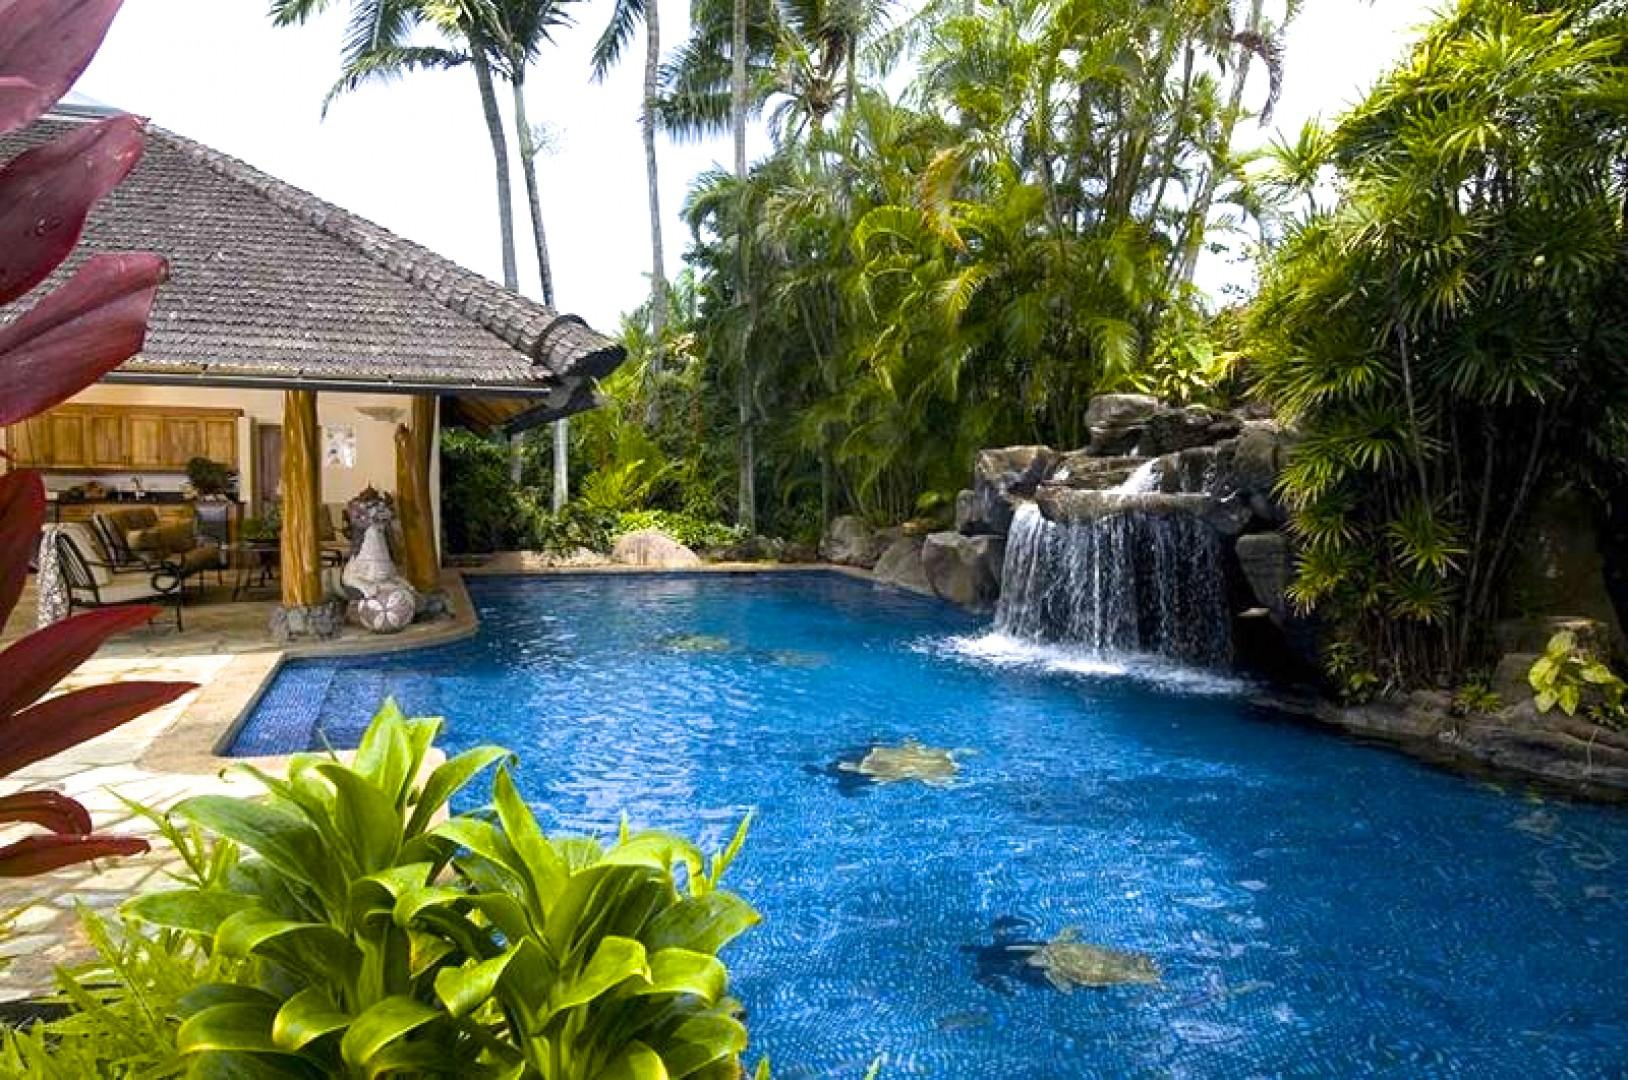 Salt water pool and Pool House